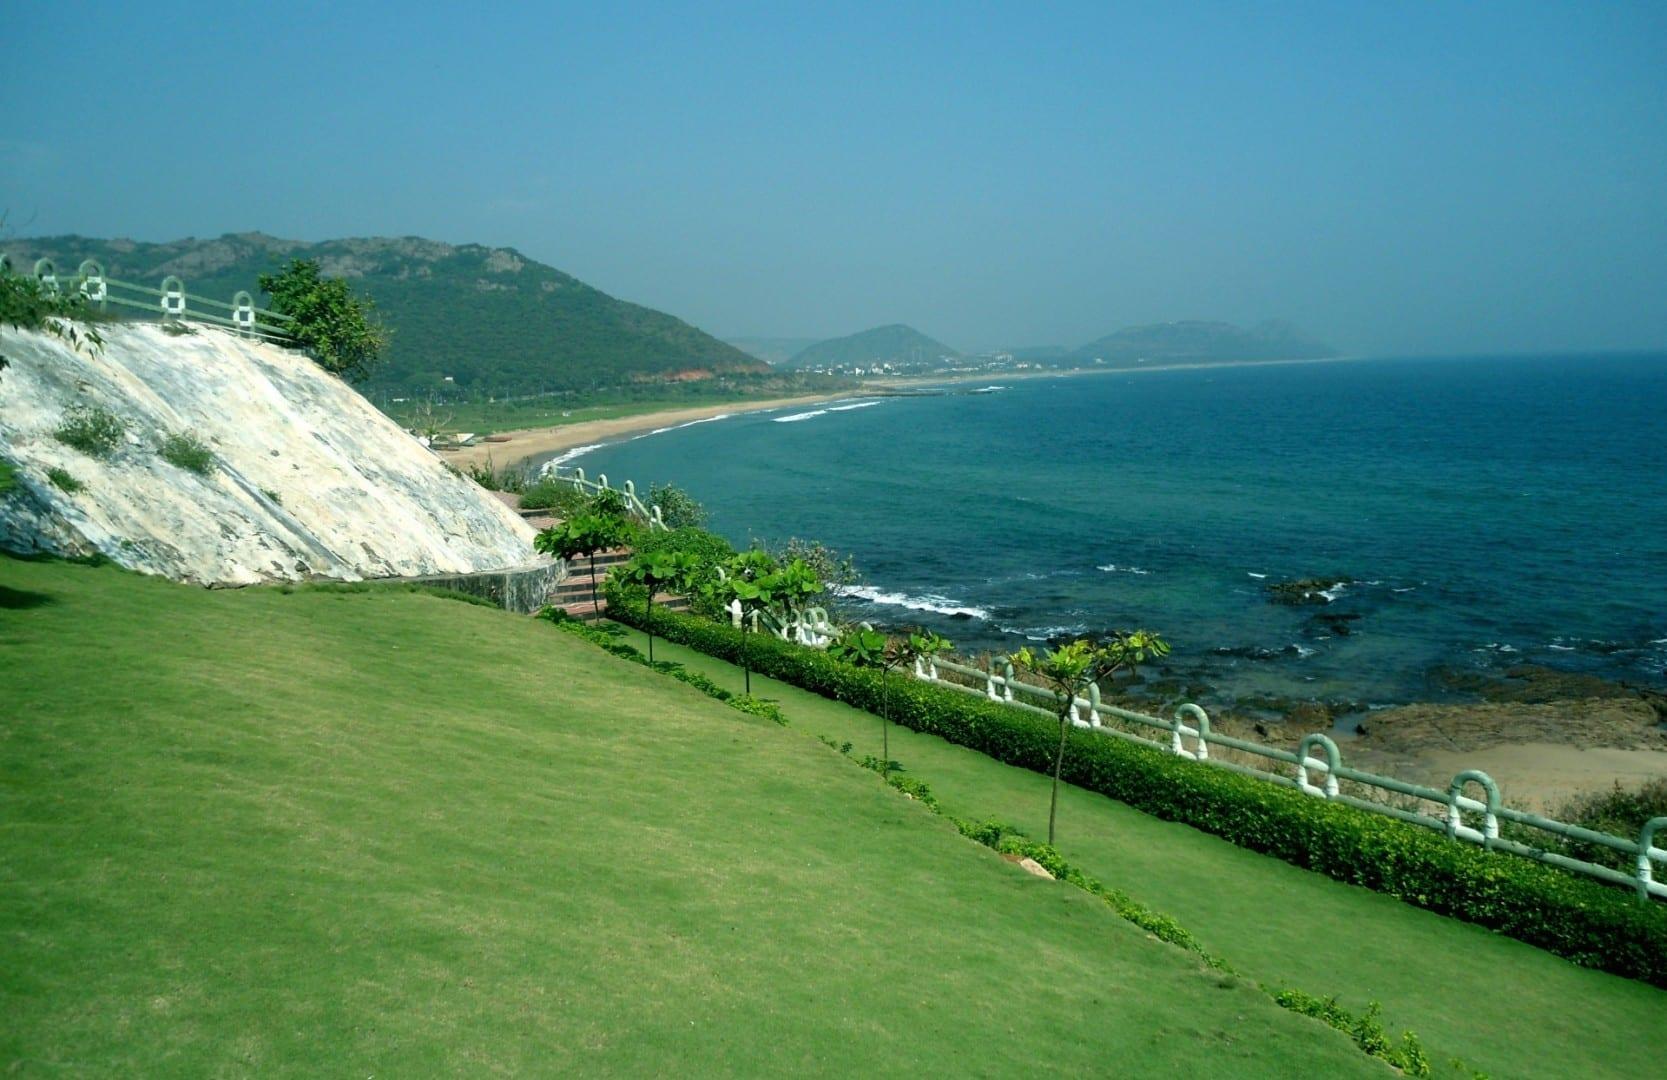 Vista de la playa en Tenneti Park en Visakhapatnam Visakhapatnam India